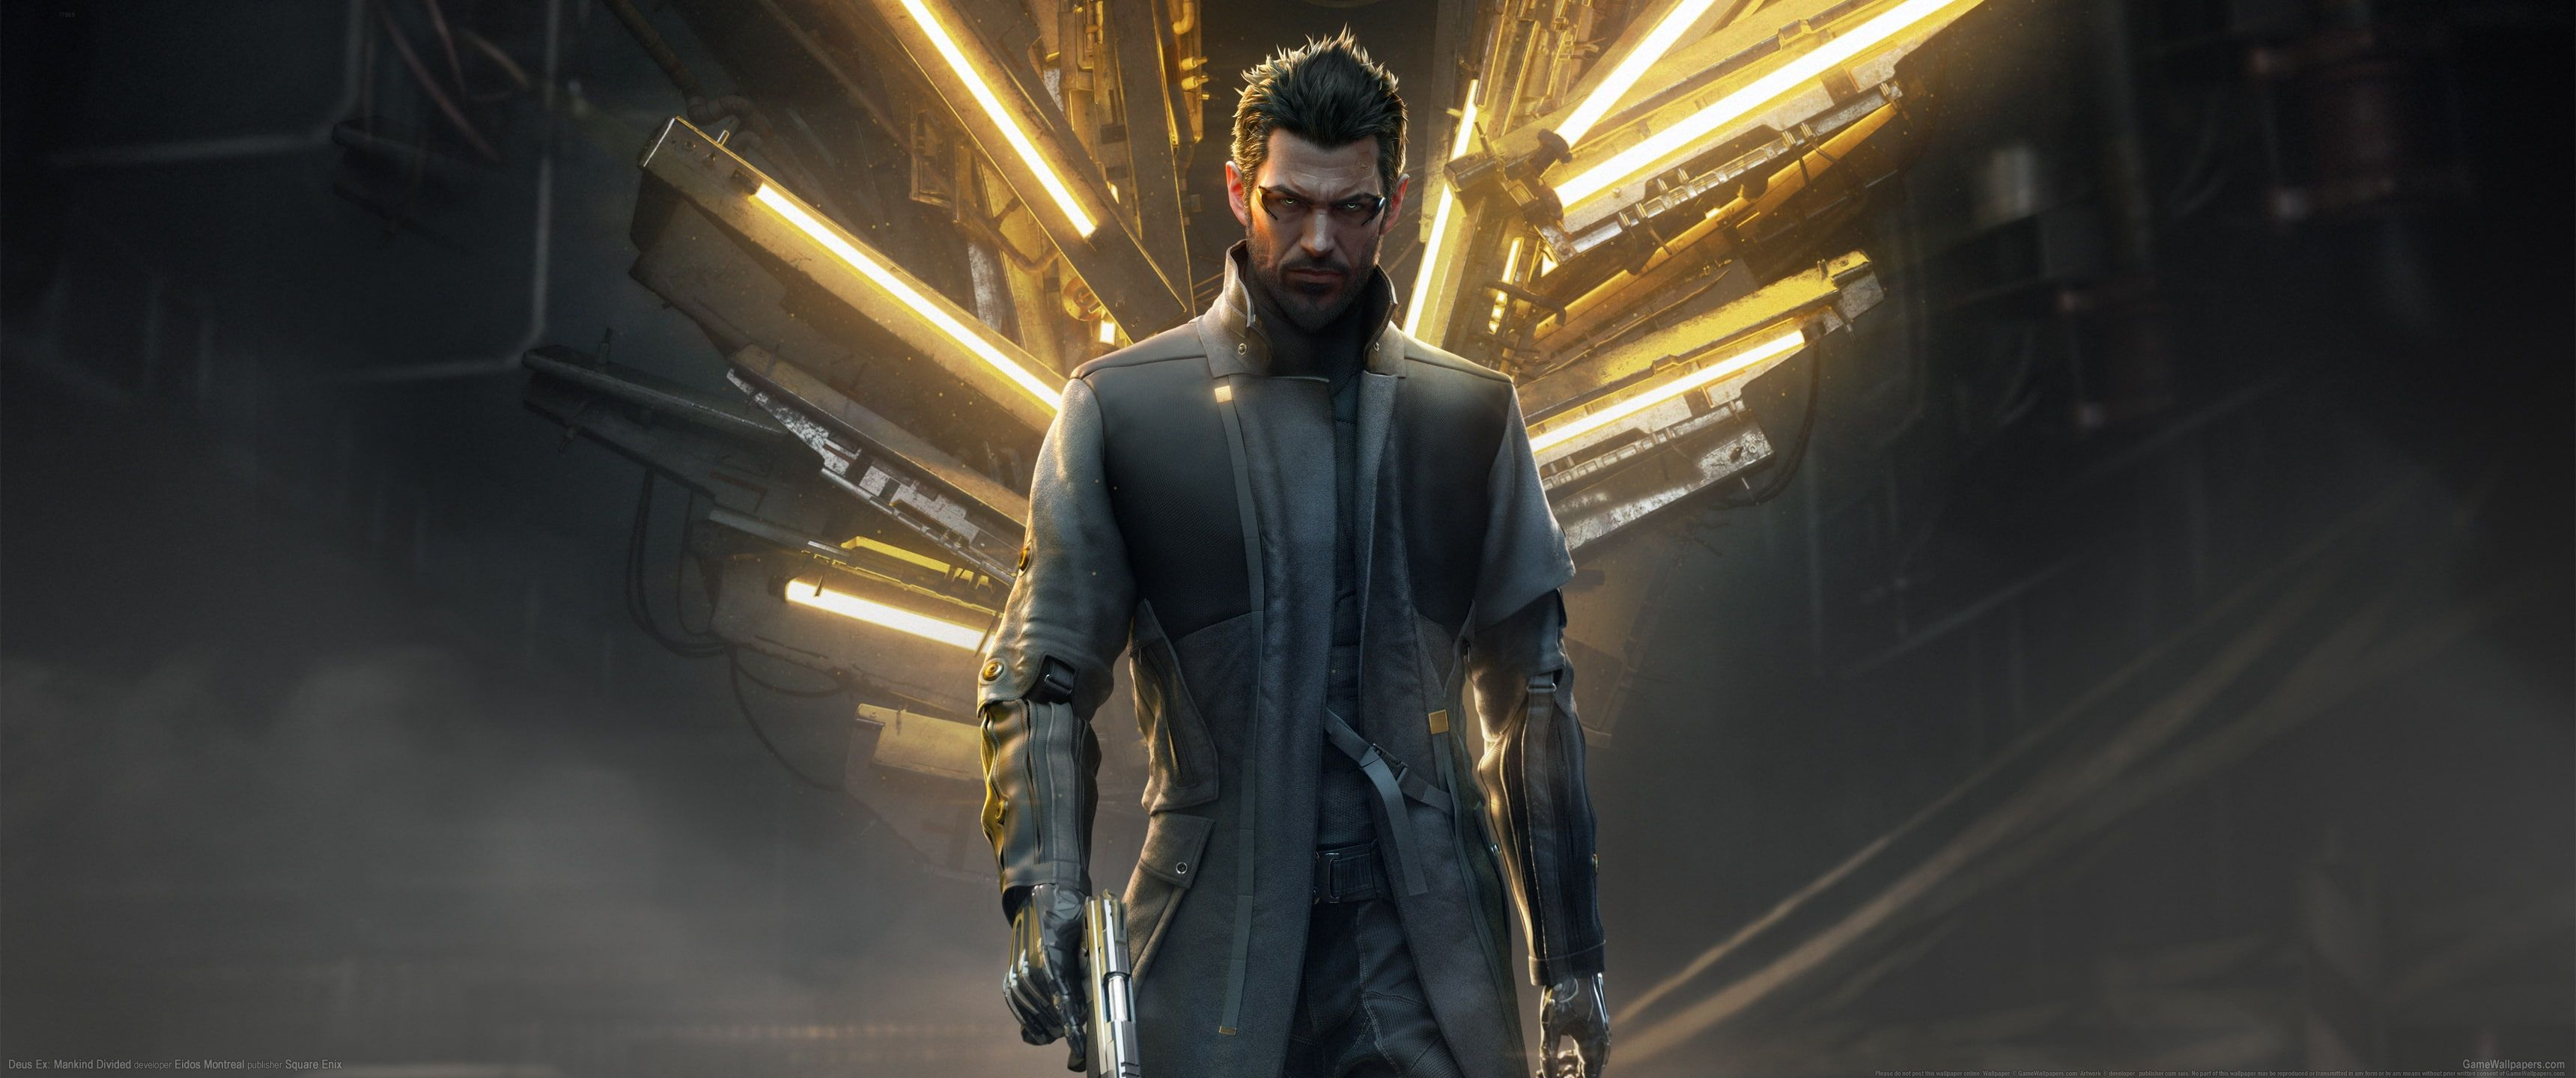 Video Games Ultrawide Ultra Wide Deus Ex Mankind Divided Cyberpunk Deus Ex 2k Wallpaper Hdwallpa Deus Ex Mankind Divided Video Games Astronaut Wallpaper